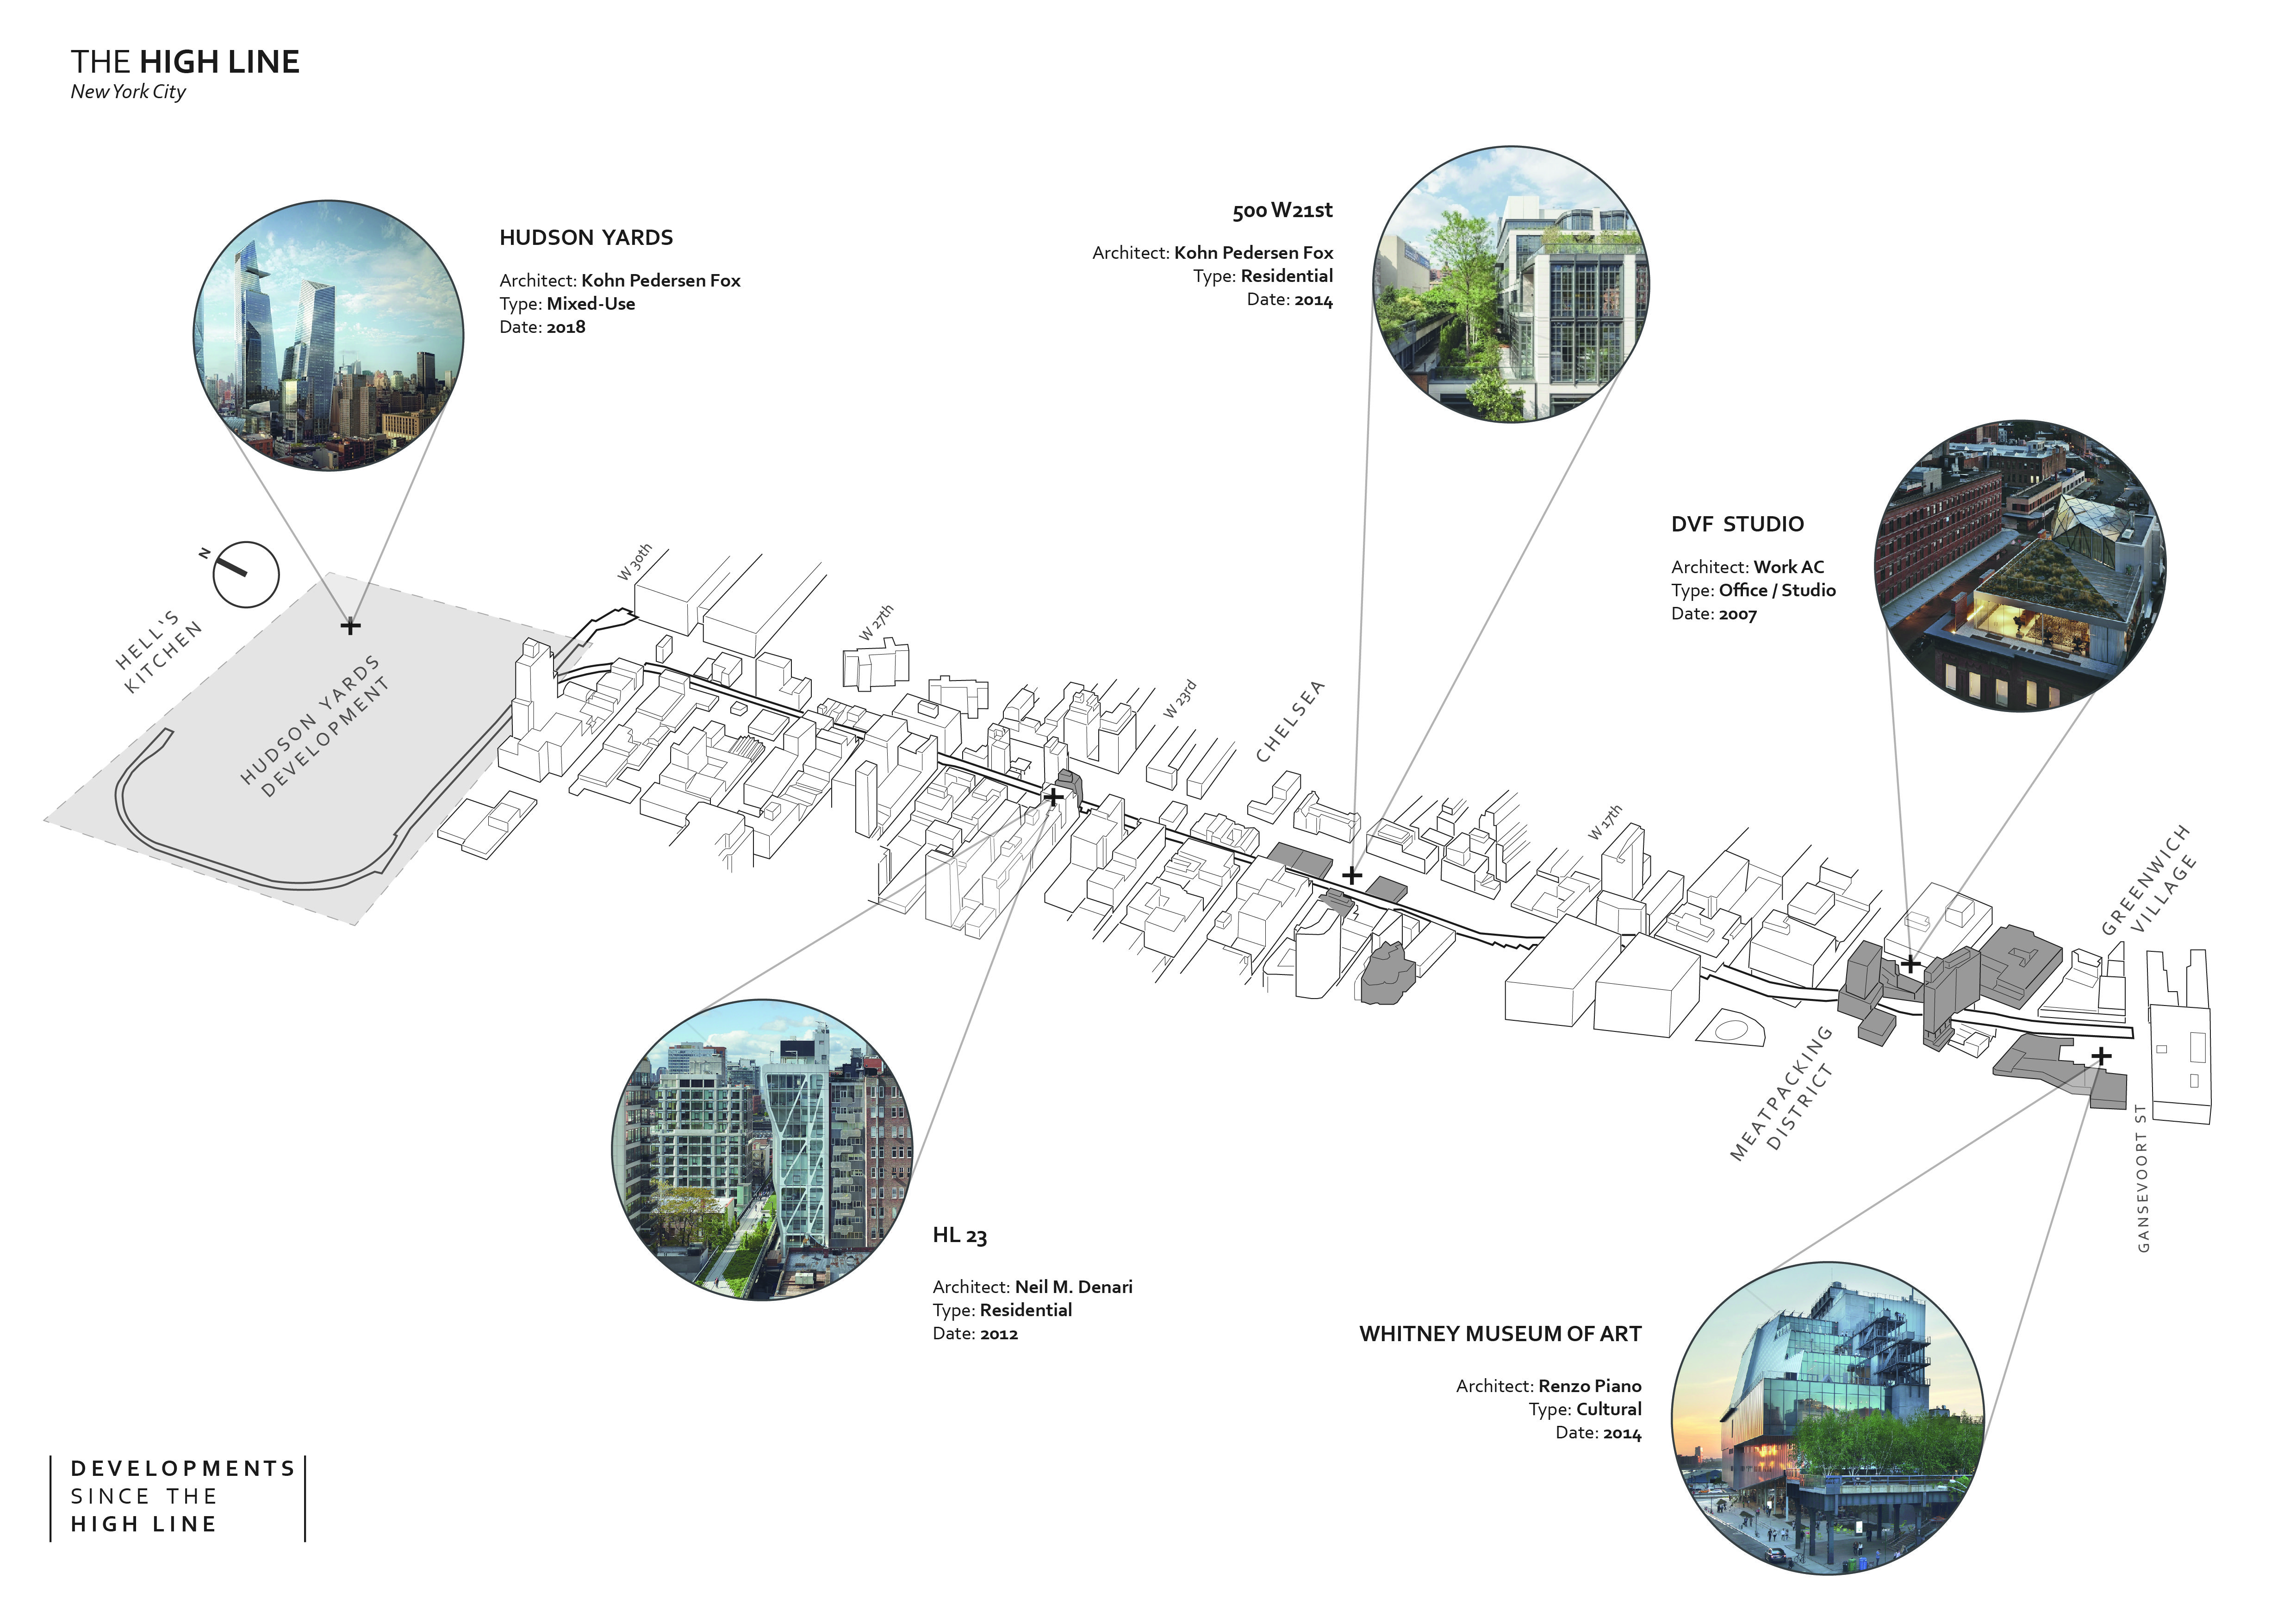 Developments Since The High Line New York